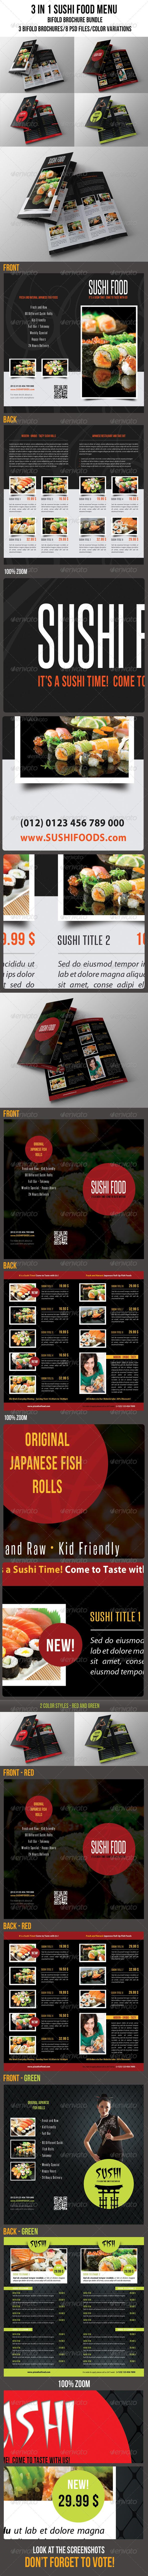 GraphicRiver 3 in 1 Sushi Food Menu BiFold Brochure Bundle 01 8435396